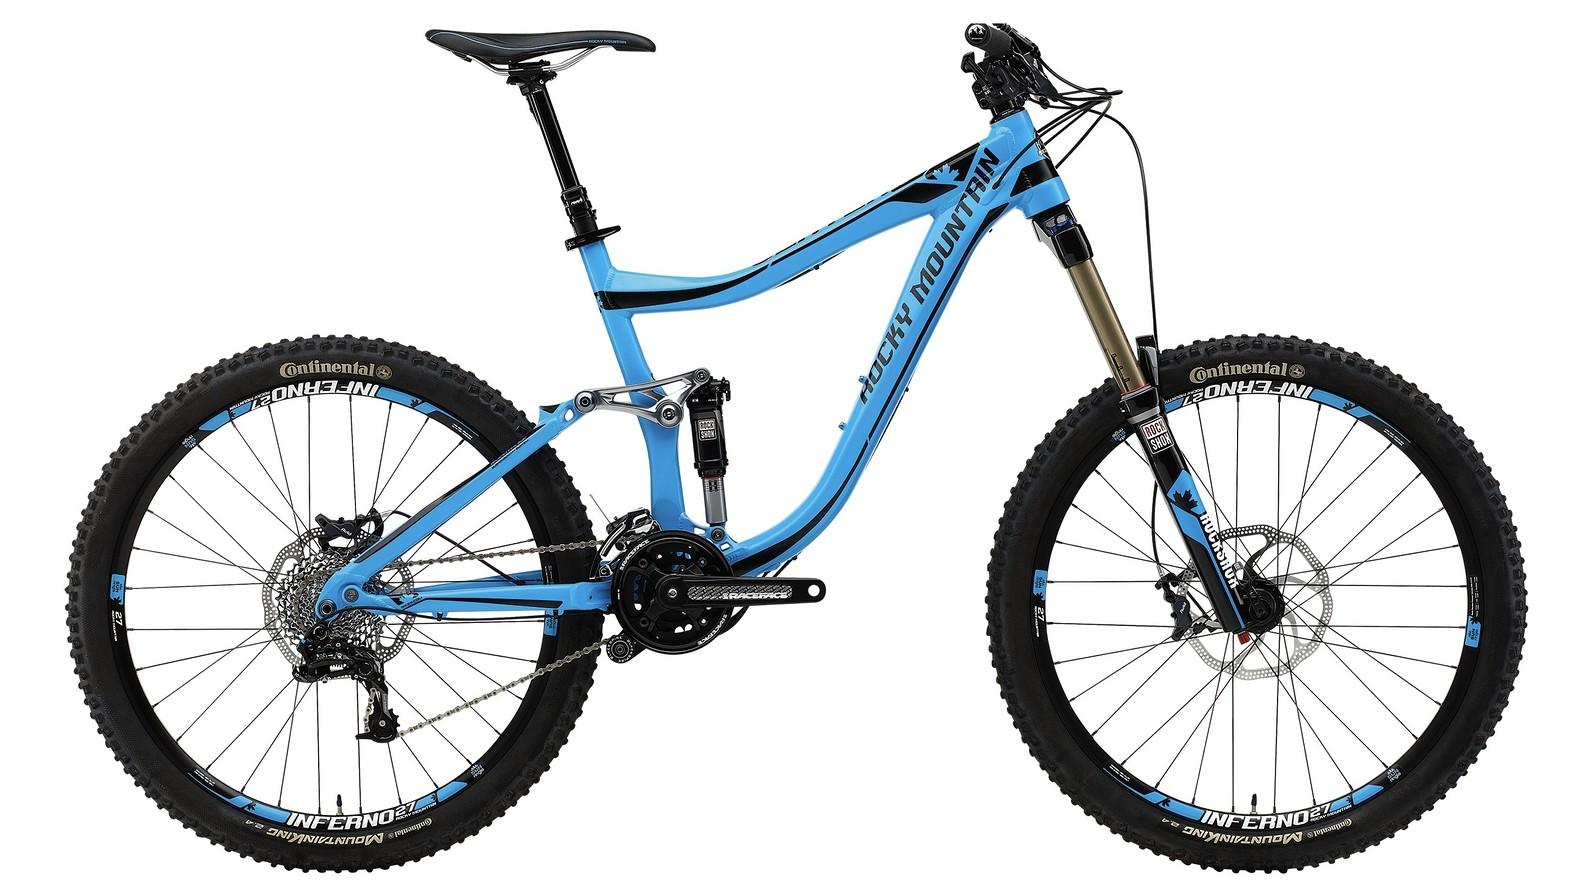 bike - 2014 Rocky Mountain Slayer 50